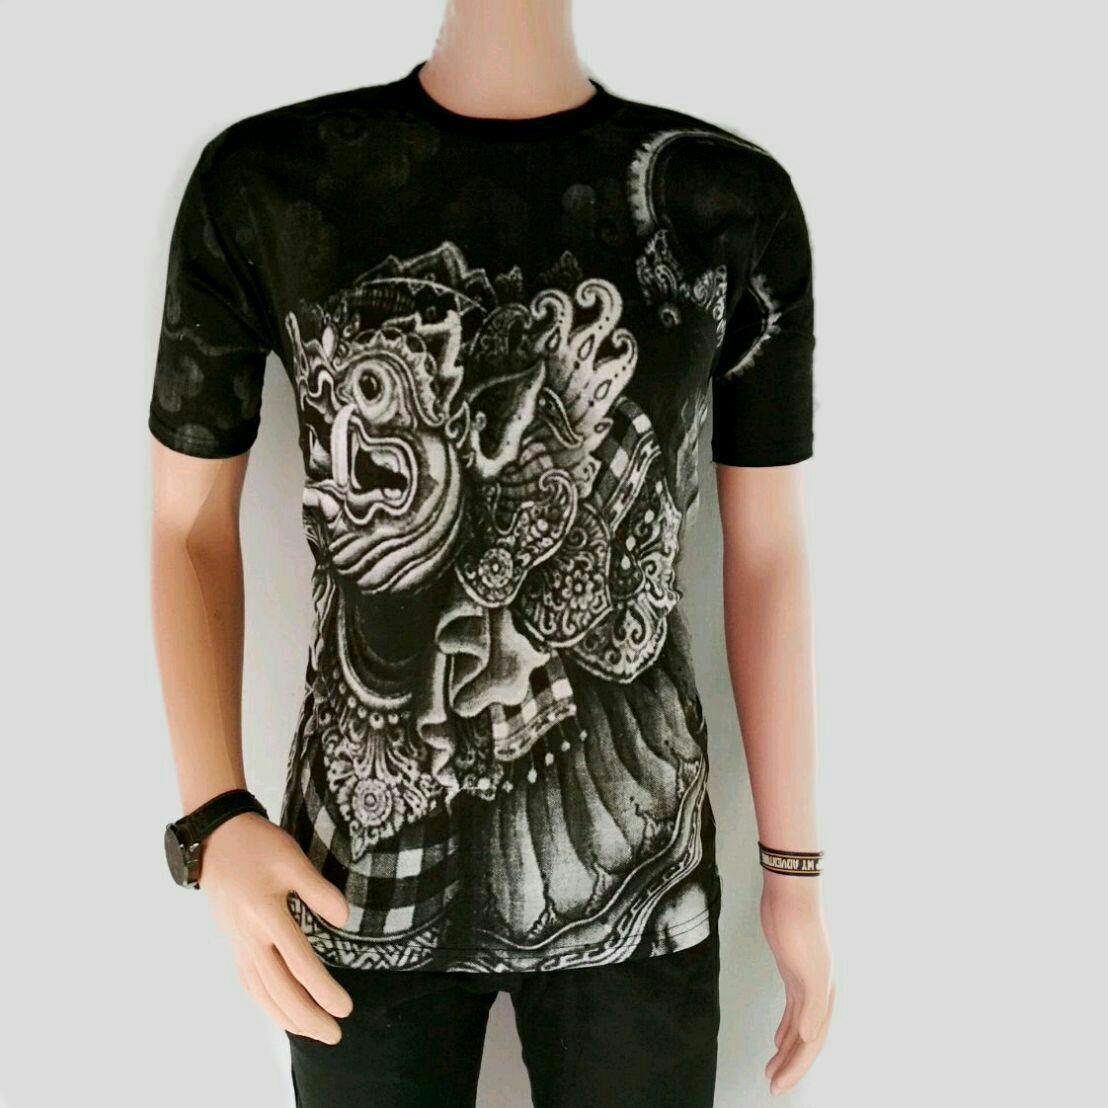 Baju Kaos Gambar Batik - Desain Kaos Menarik